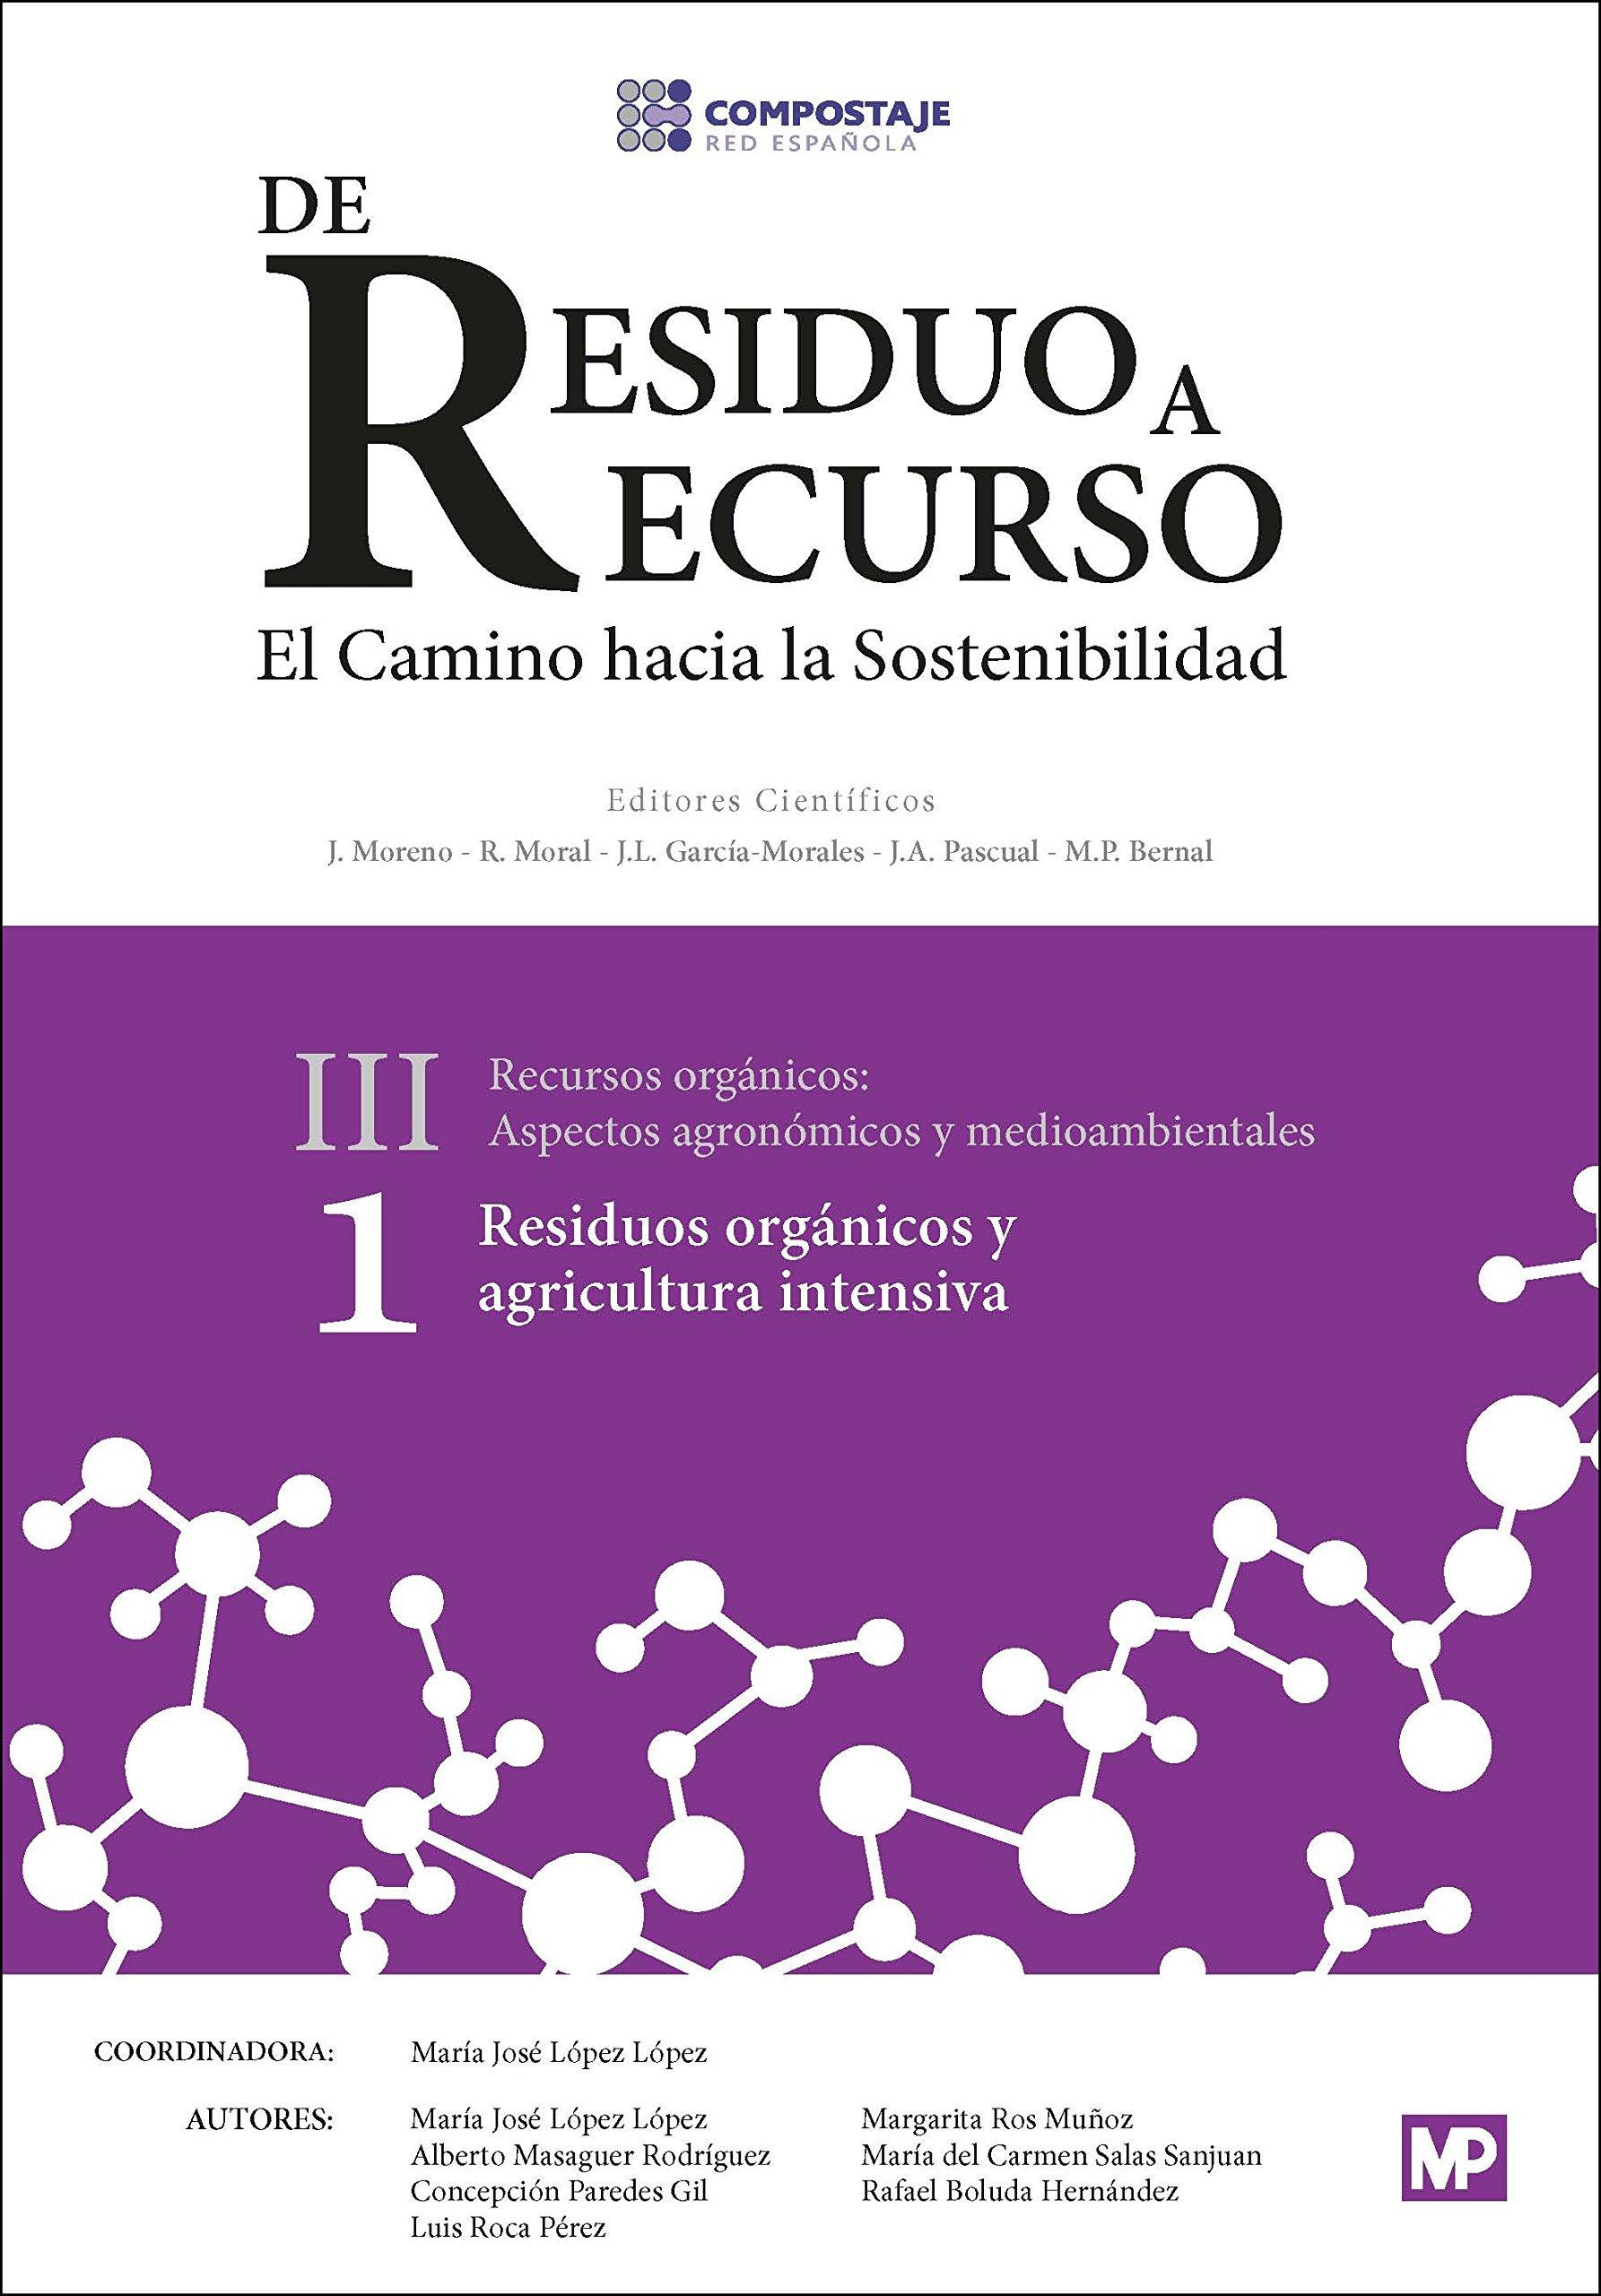 Residuos orgánicos y agricultura intensiva III.1: Varios: 9788484767077: Amazon.com: Books